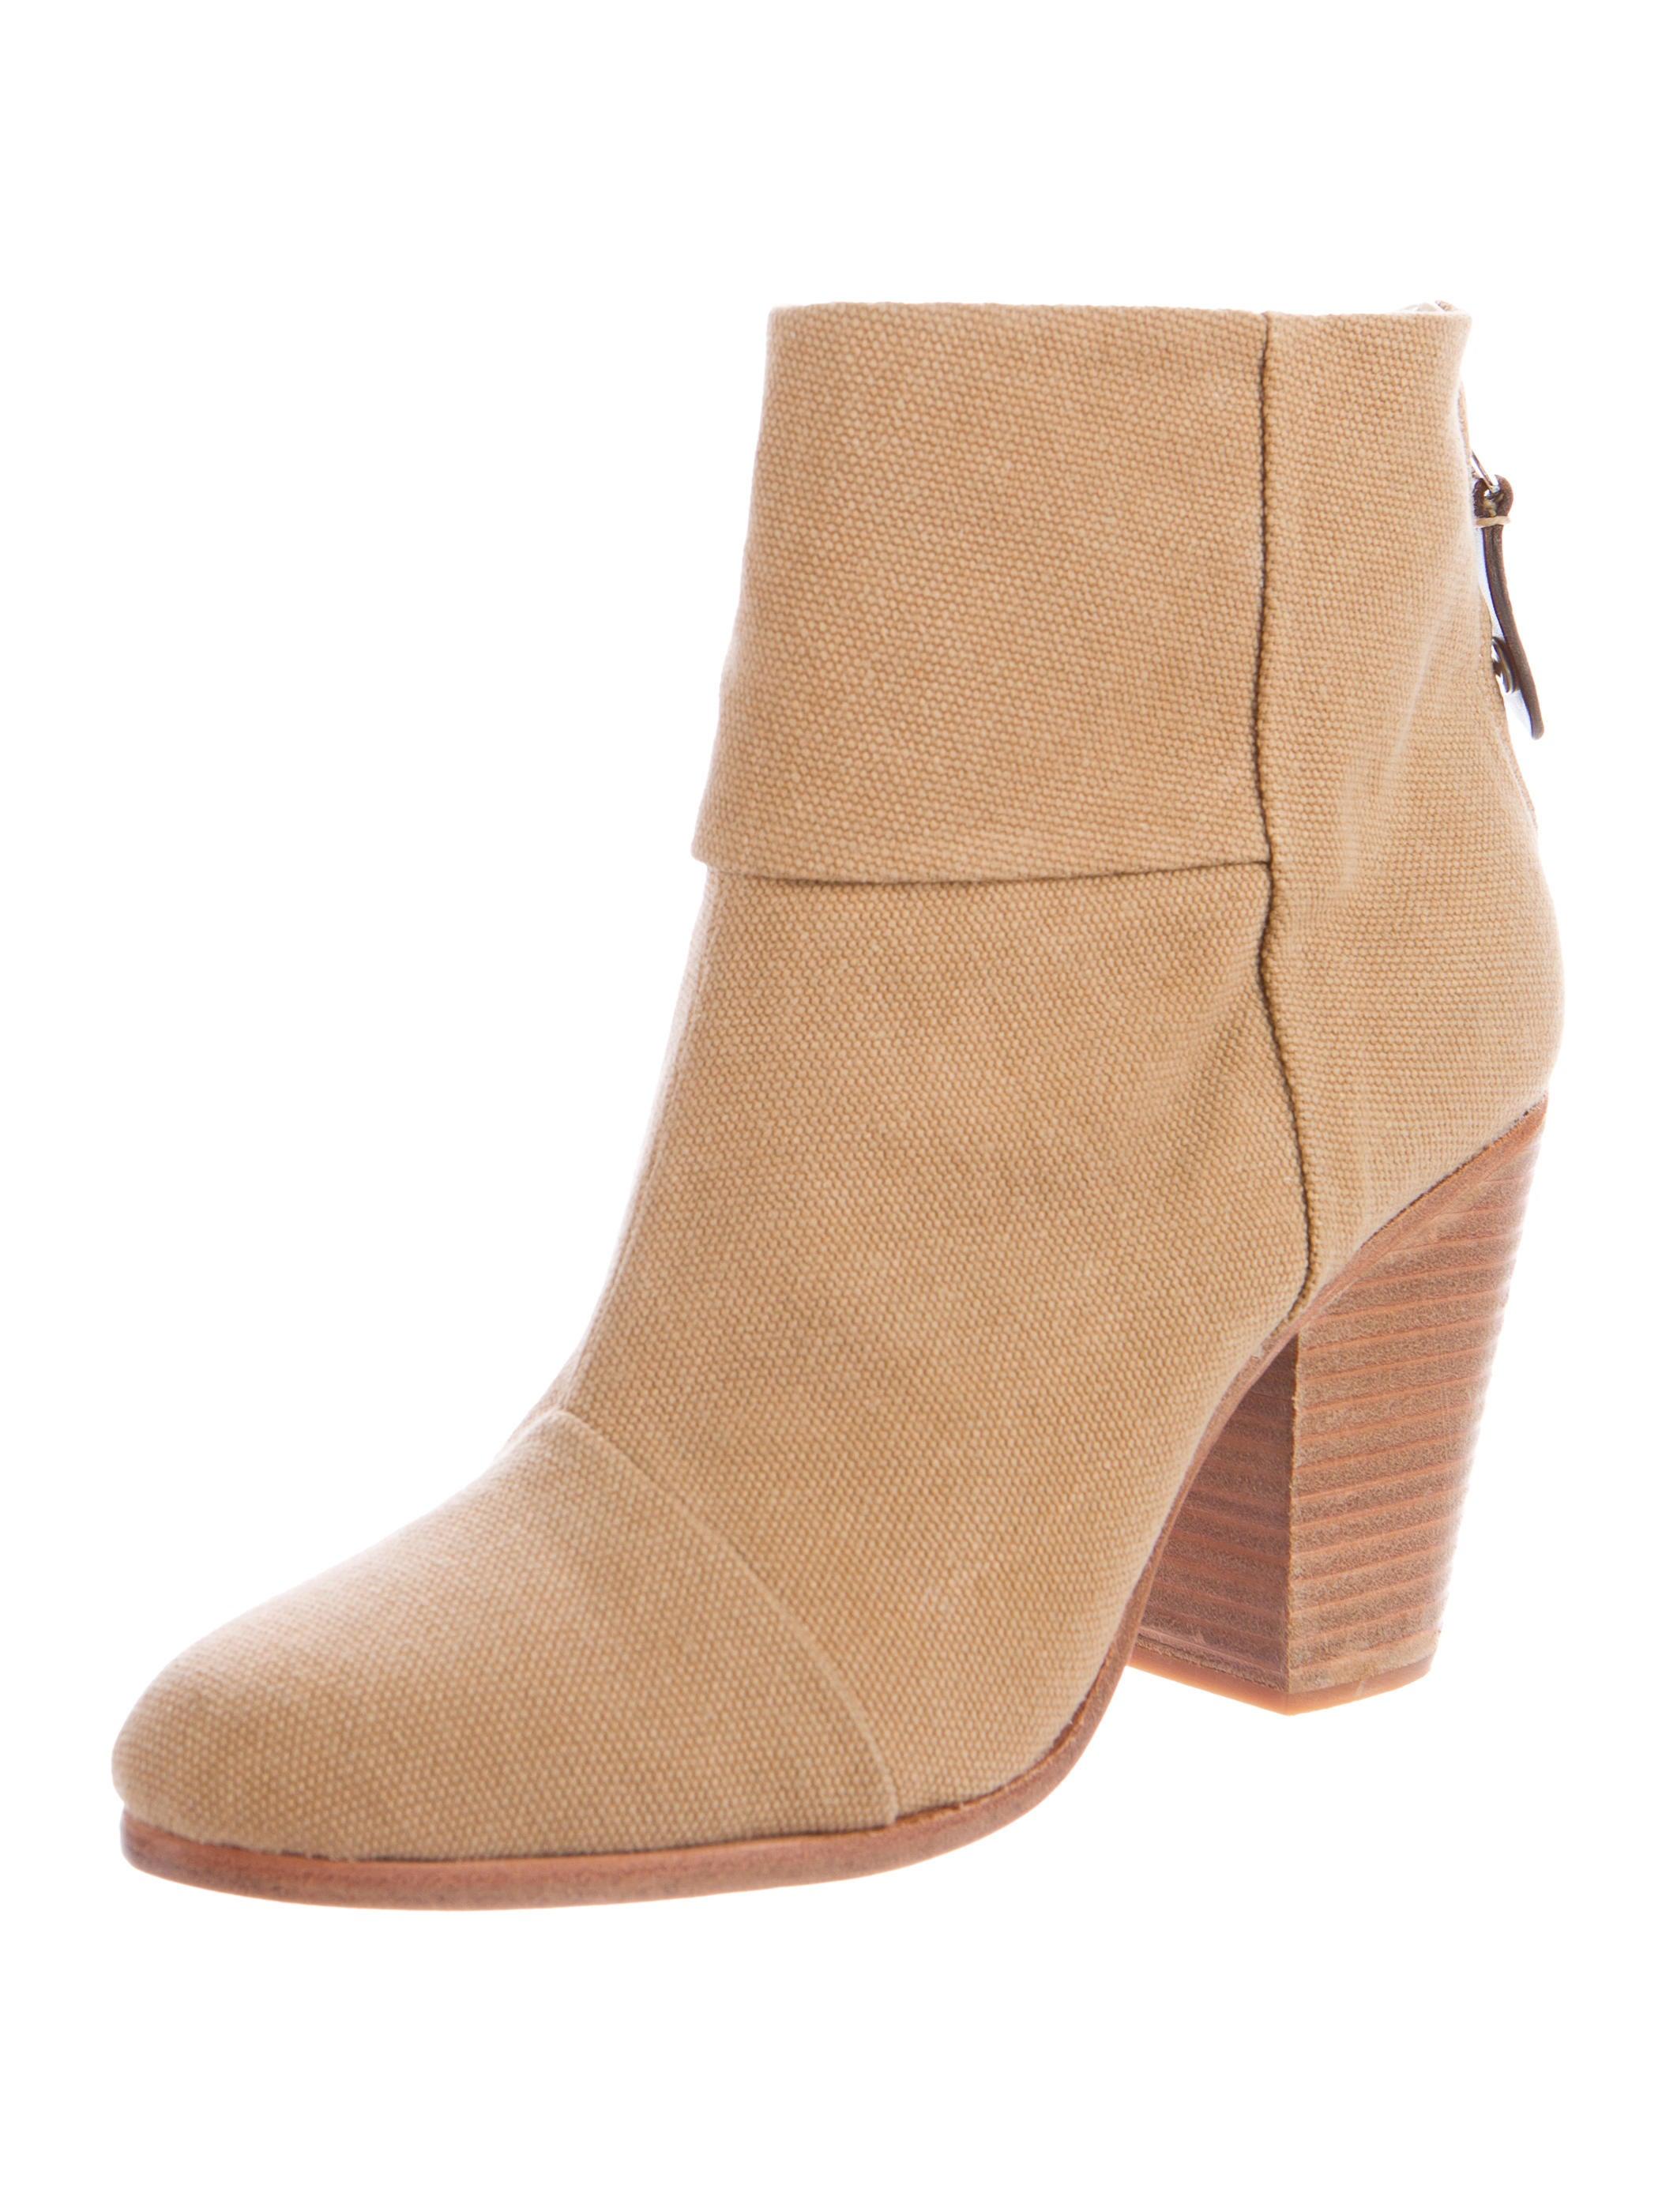 rag bone newbury canvas ankle boots shoes wragb64471